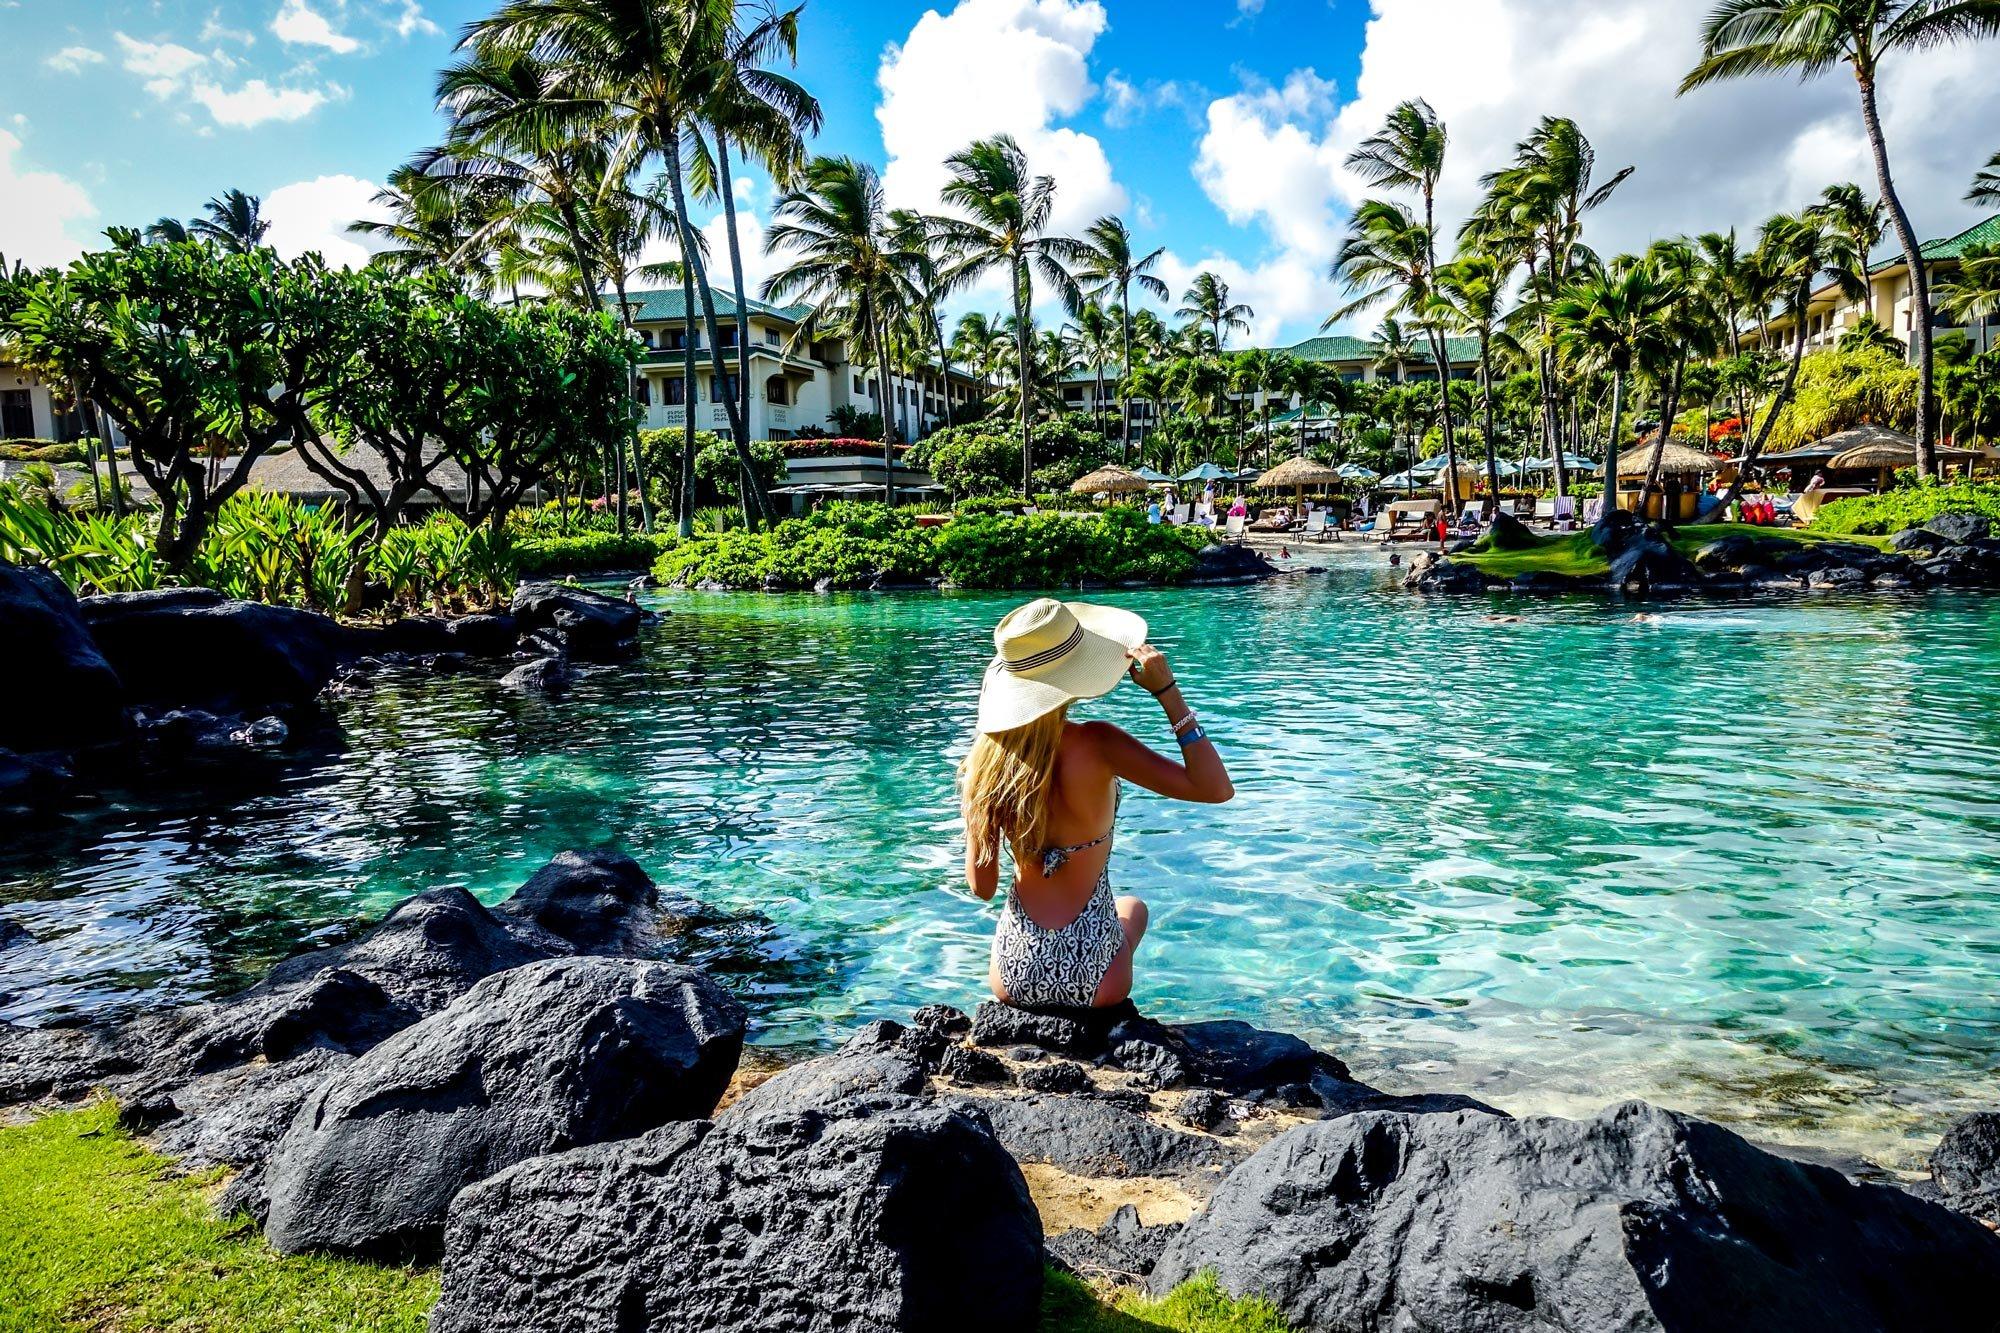 Bubbly Moments | Travel Blog | Celebrate Life's Bubbly Moments | Travel Influencer | Emilia Bubbly Moments